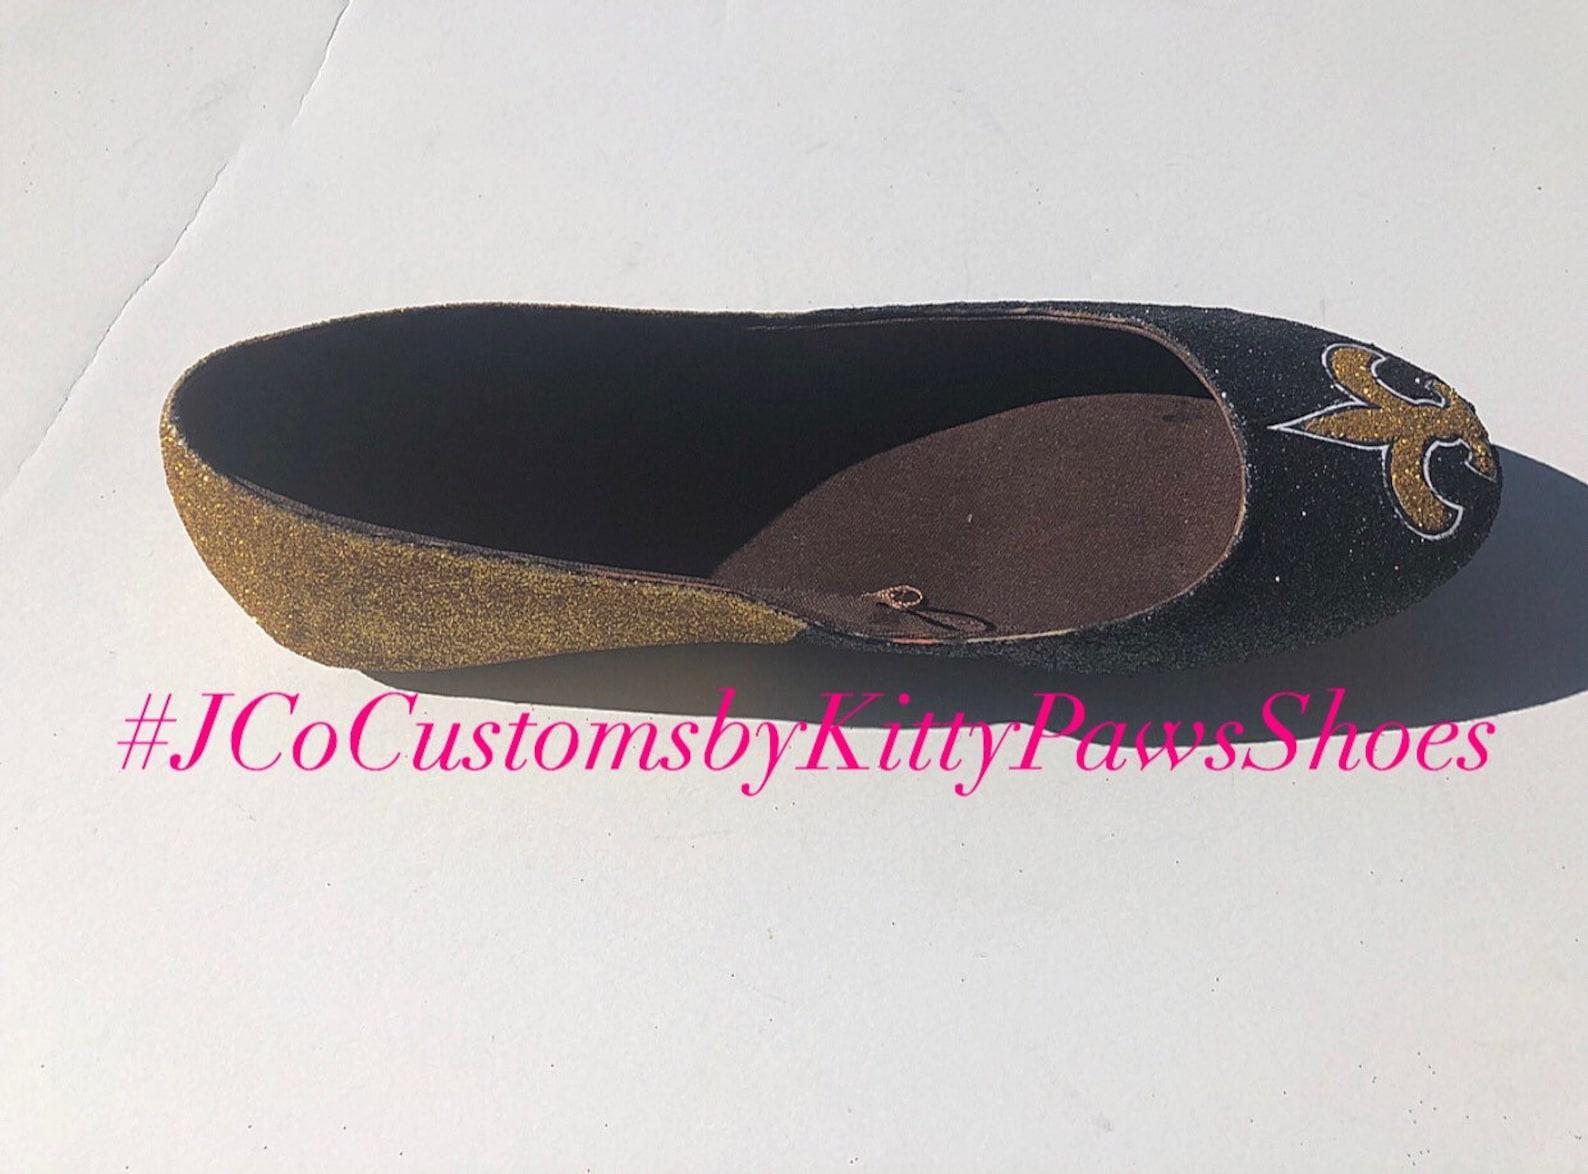 saints flats custom women's new orleans gold and black glitter fan ballet shoes *free u.s. shipping* jco.customs by kitty pa